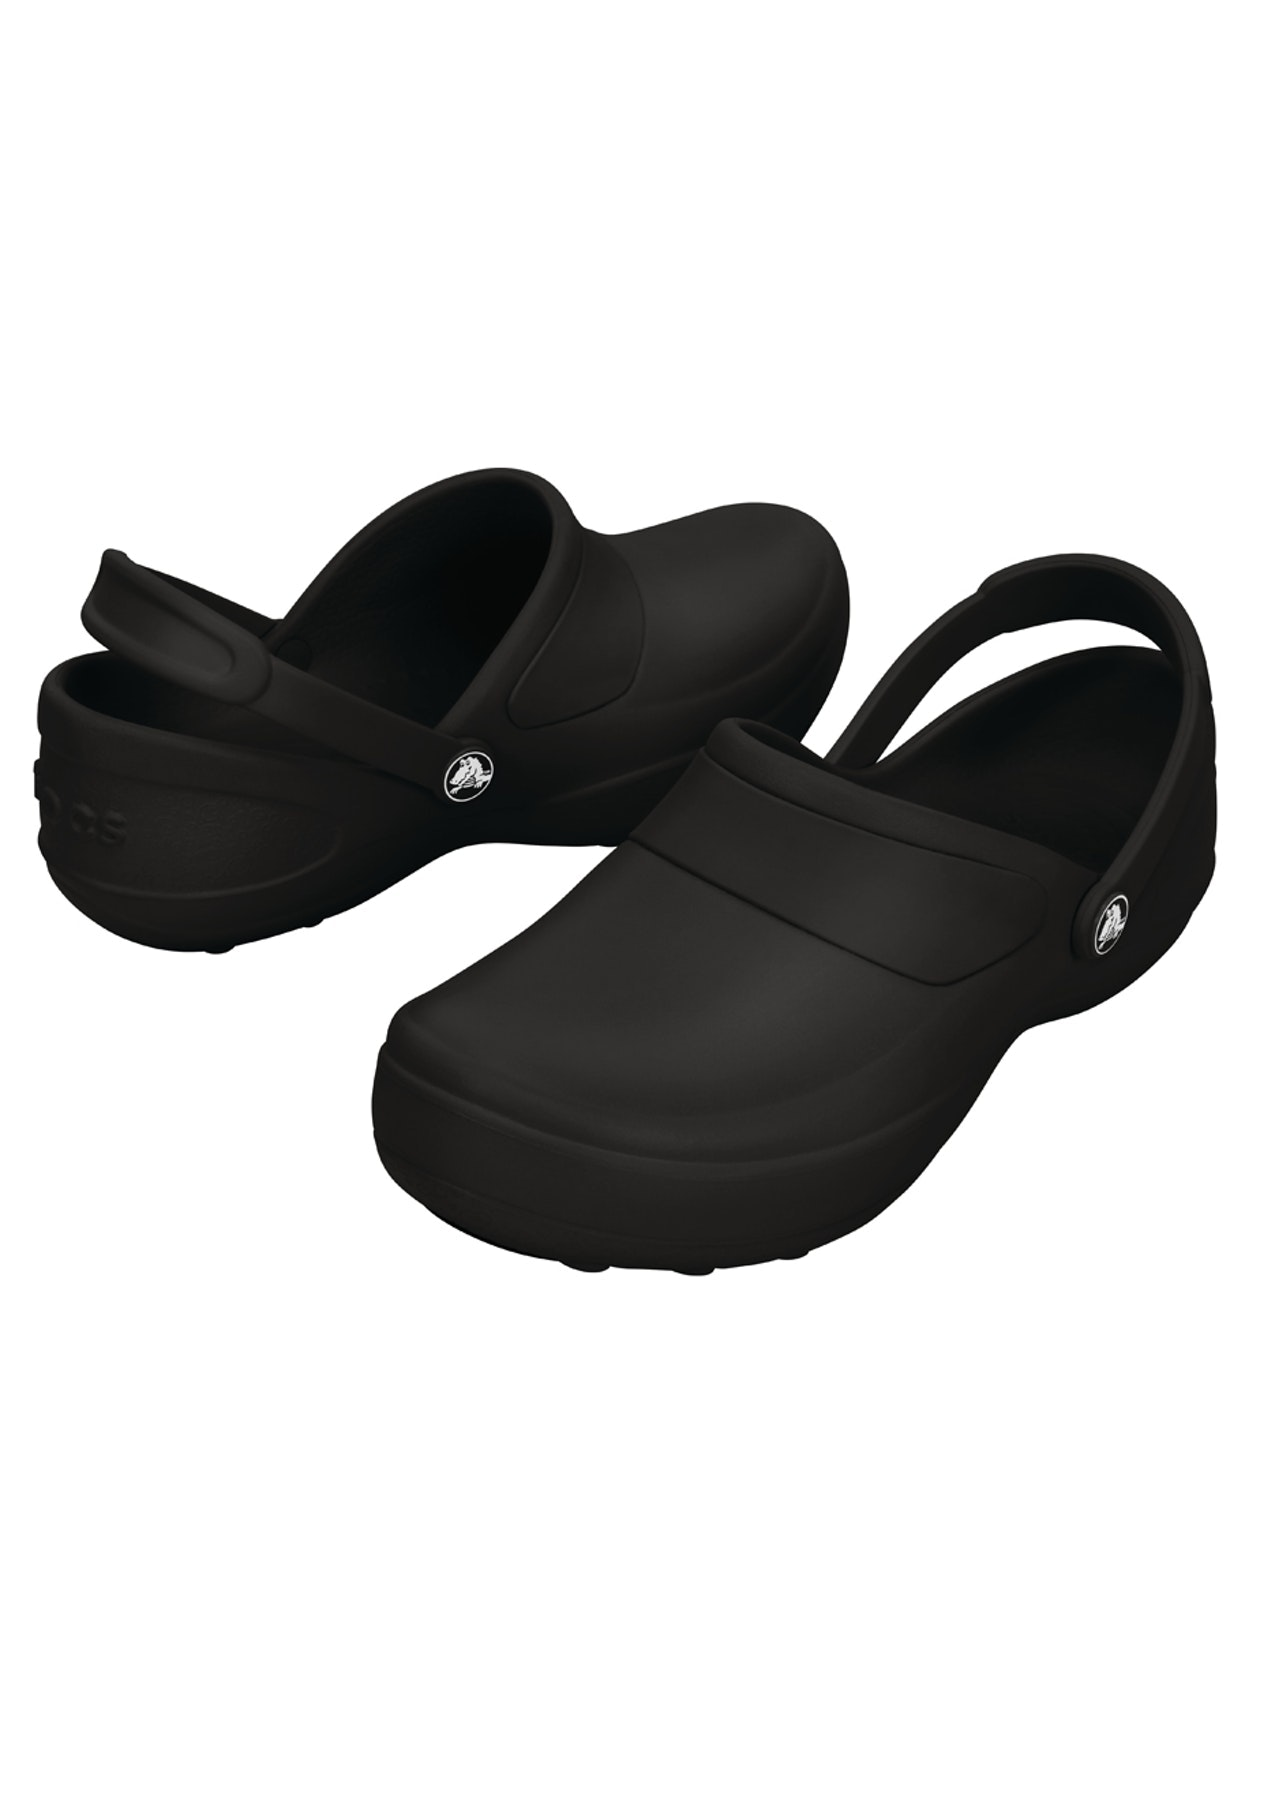 a02c246b9 CROCS - Womens Mercy Work - Black Black - Under  60 Shoes - Onceit